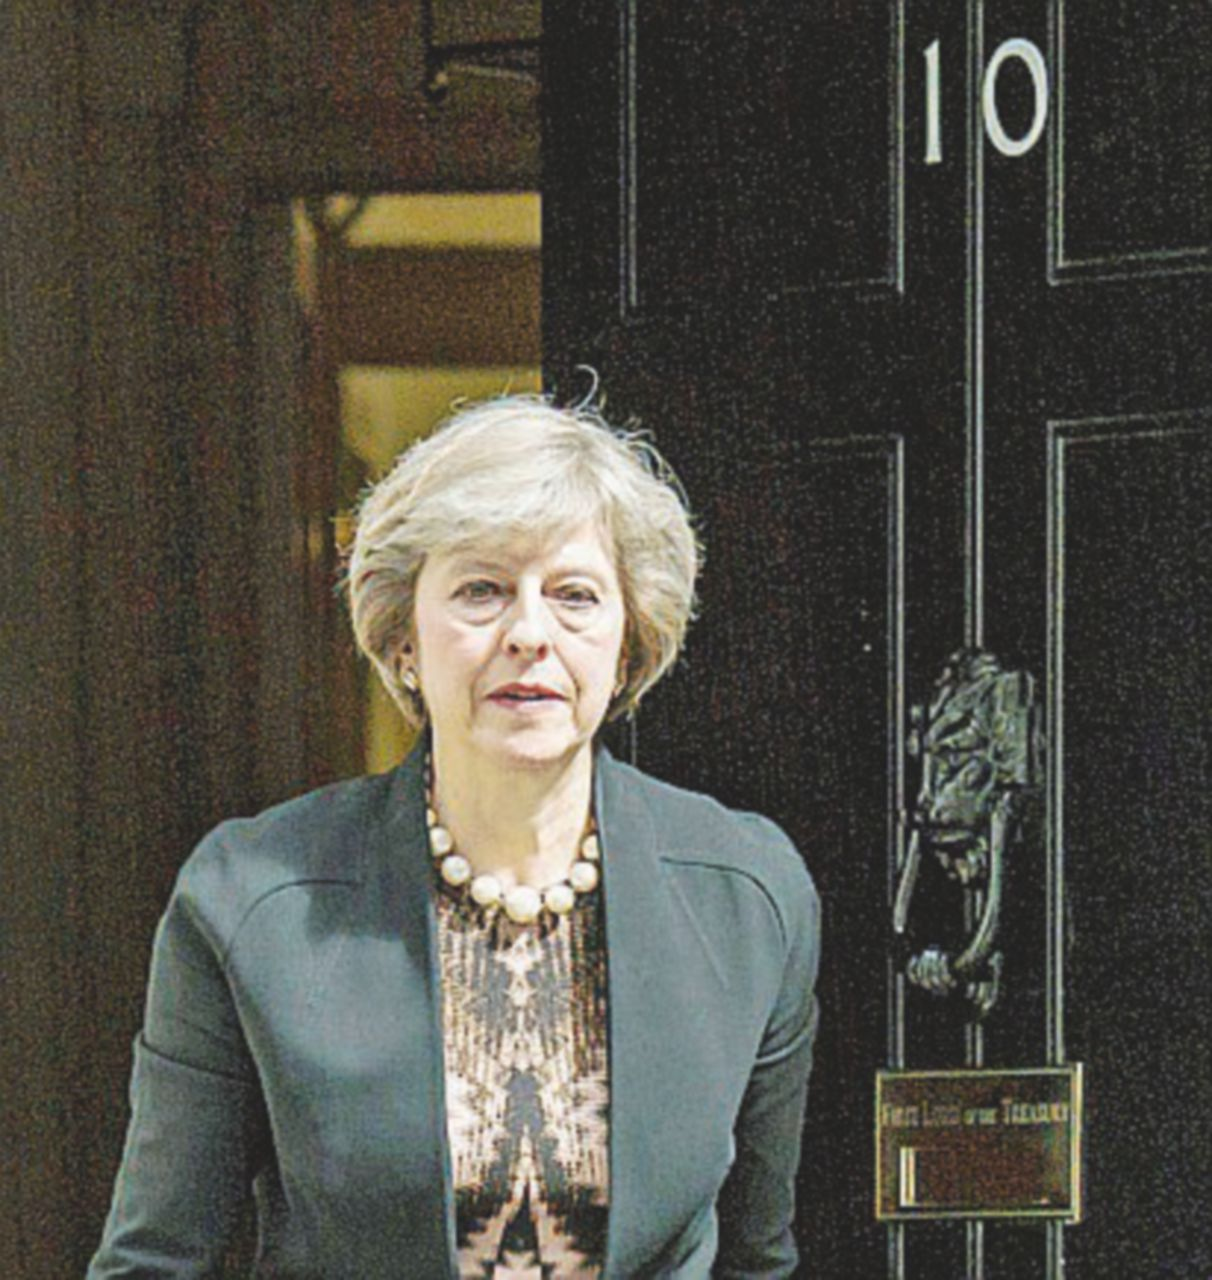 Pugnalate e altre trame: soap opera Brexit